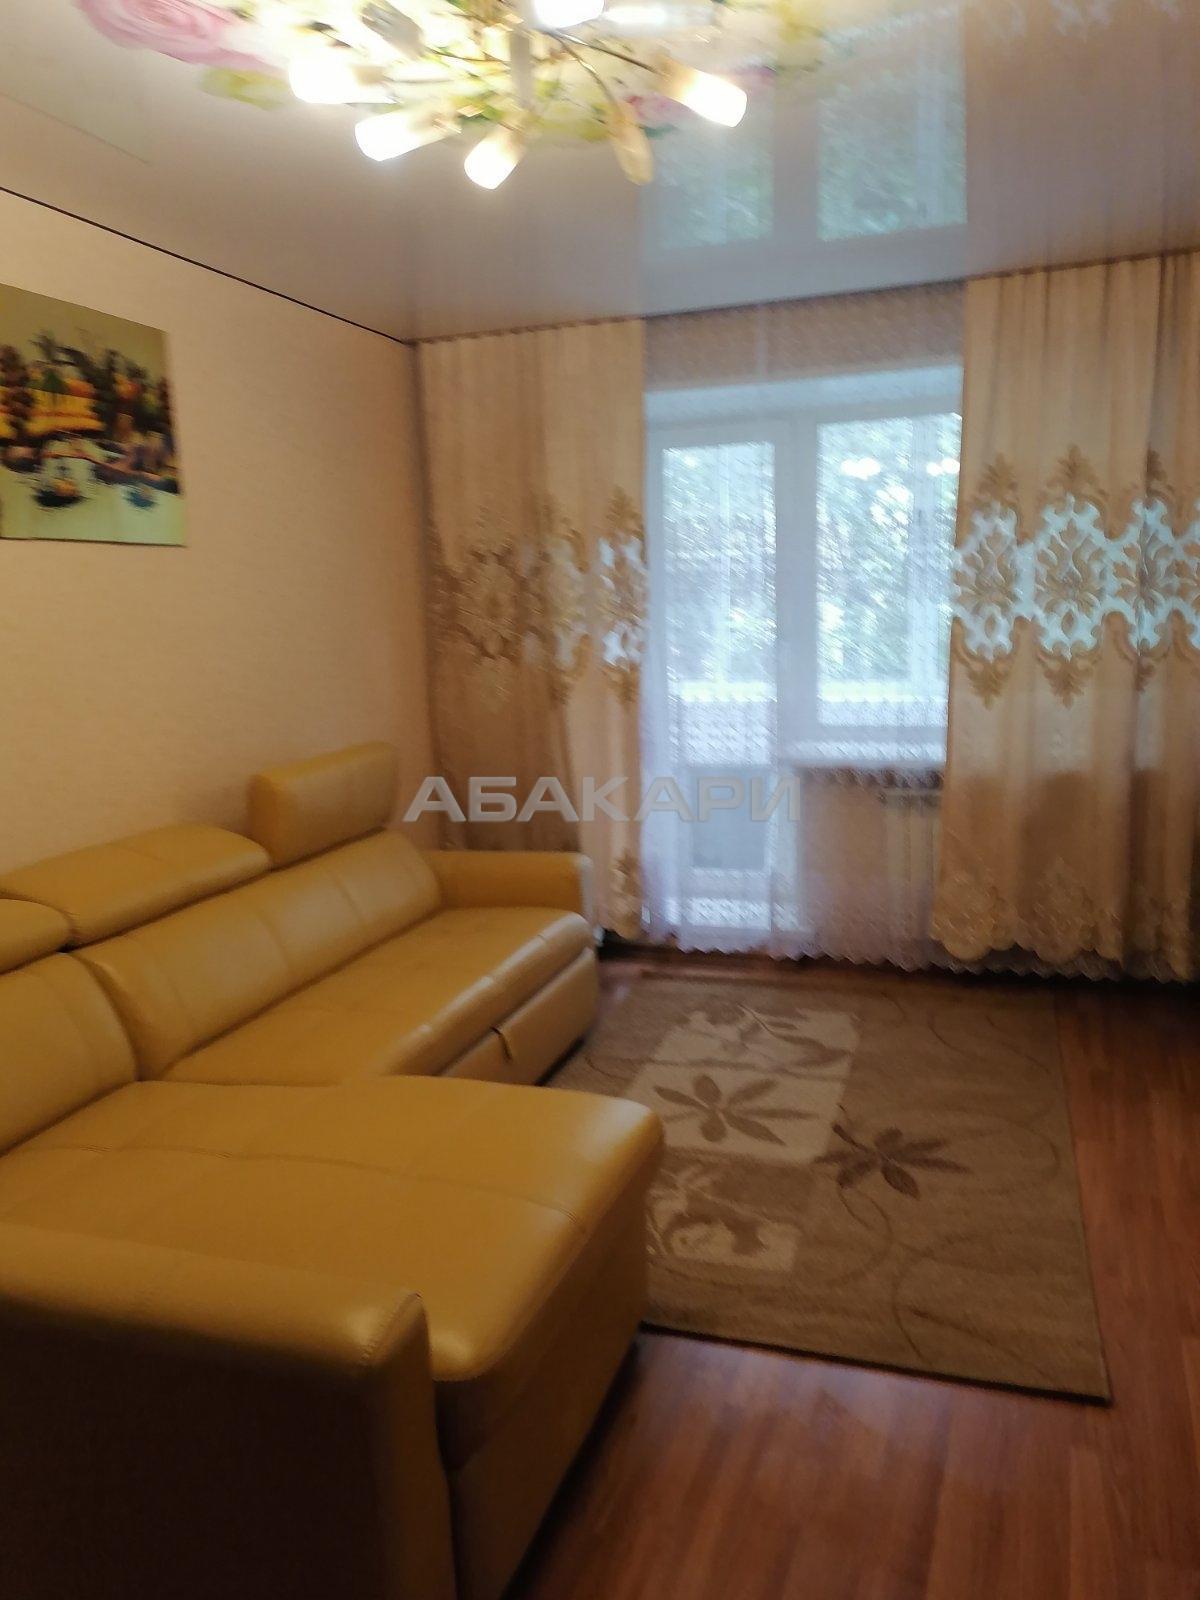 3к квартира Аэровокзальная улица, 2Б | 28000 | аренда в Красноярске фото 1